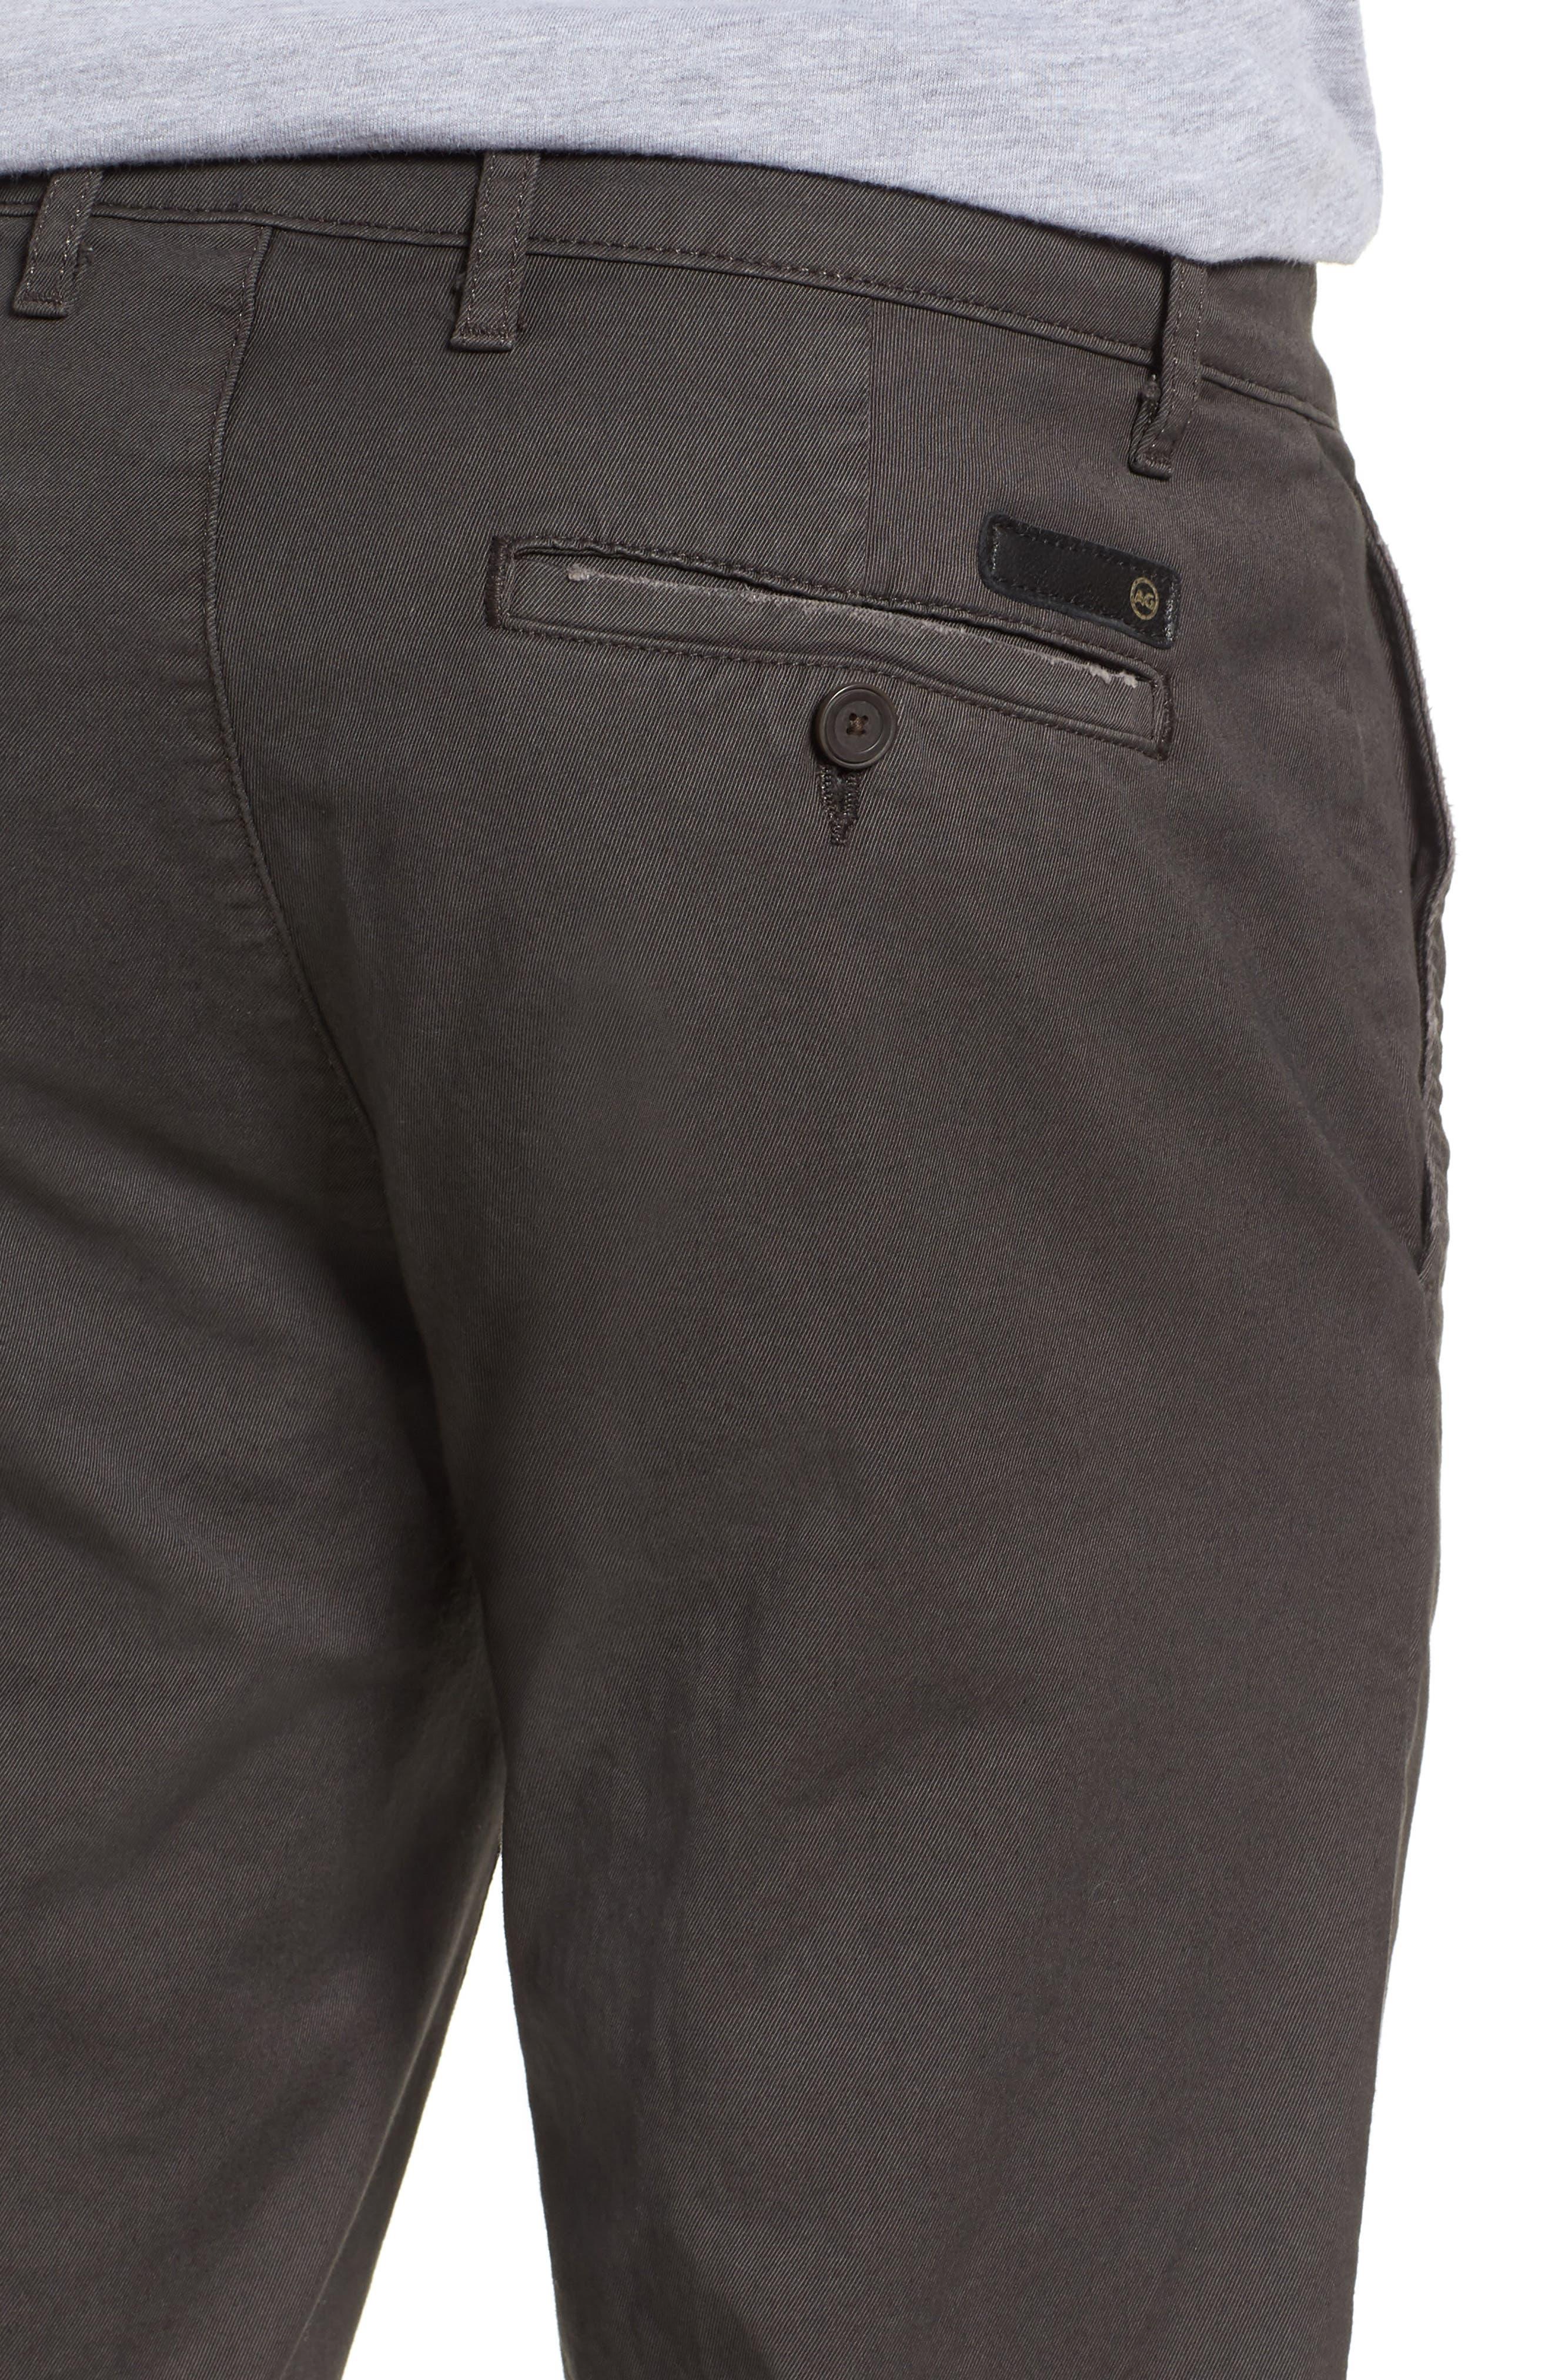 Marshall Slim Straight Leg Chino Pants,                             Alternate thumbnail 4, color,                             039